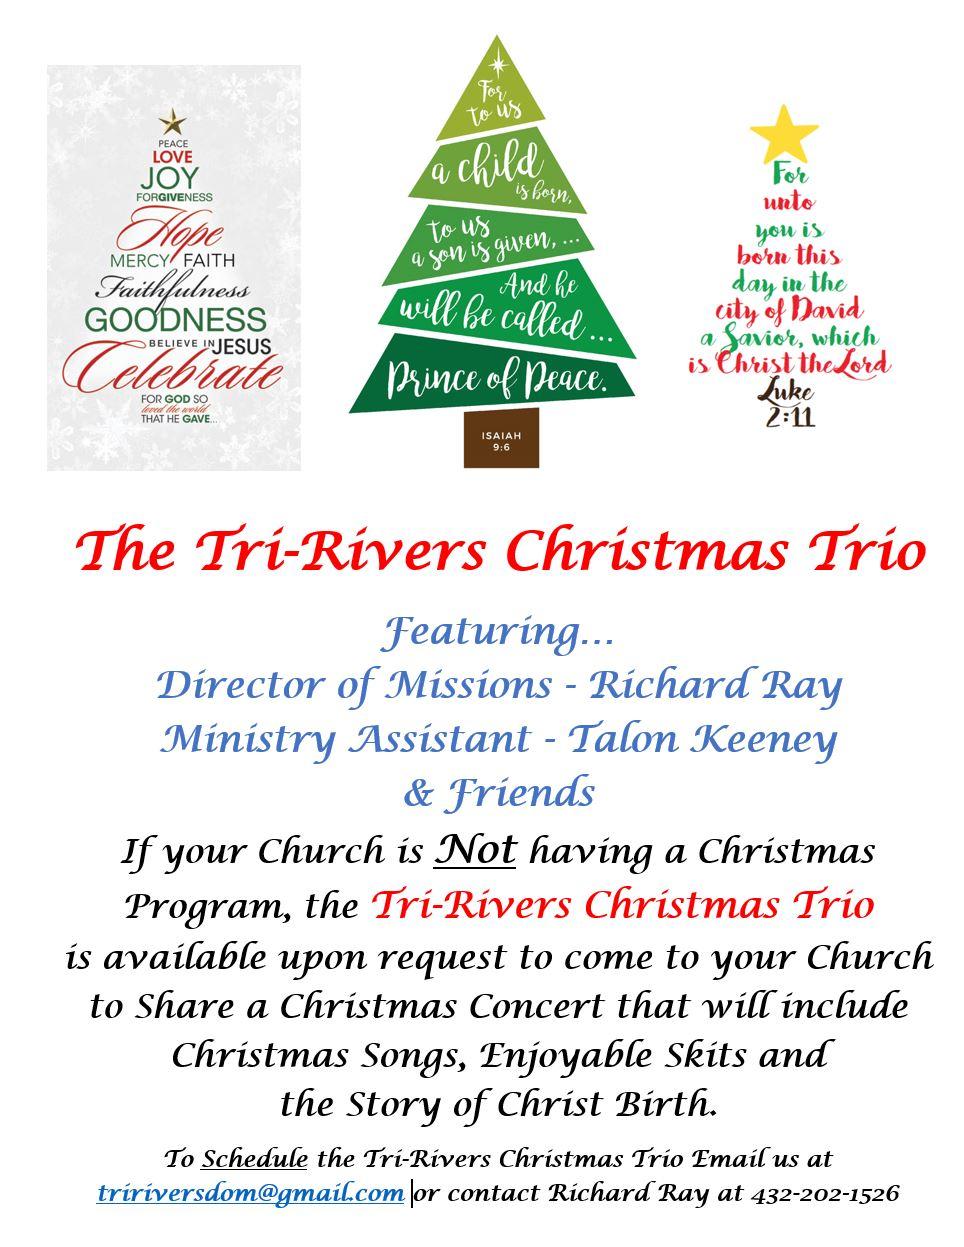 TRBA Christmas Trio 2021 Poster.JPG